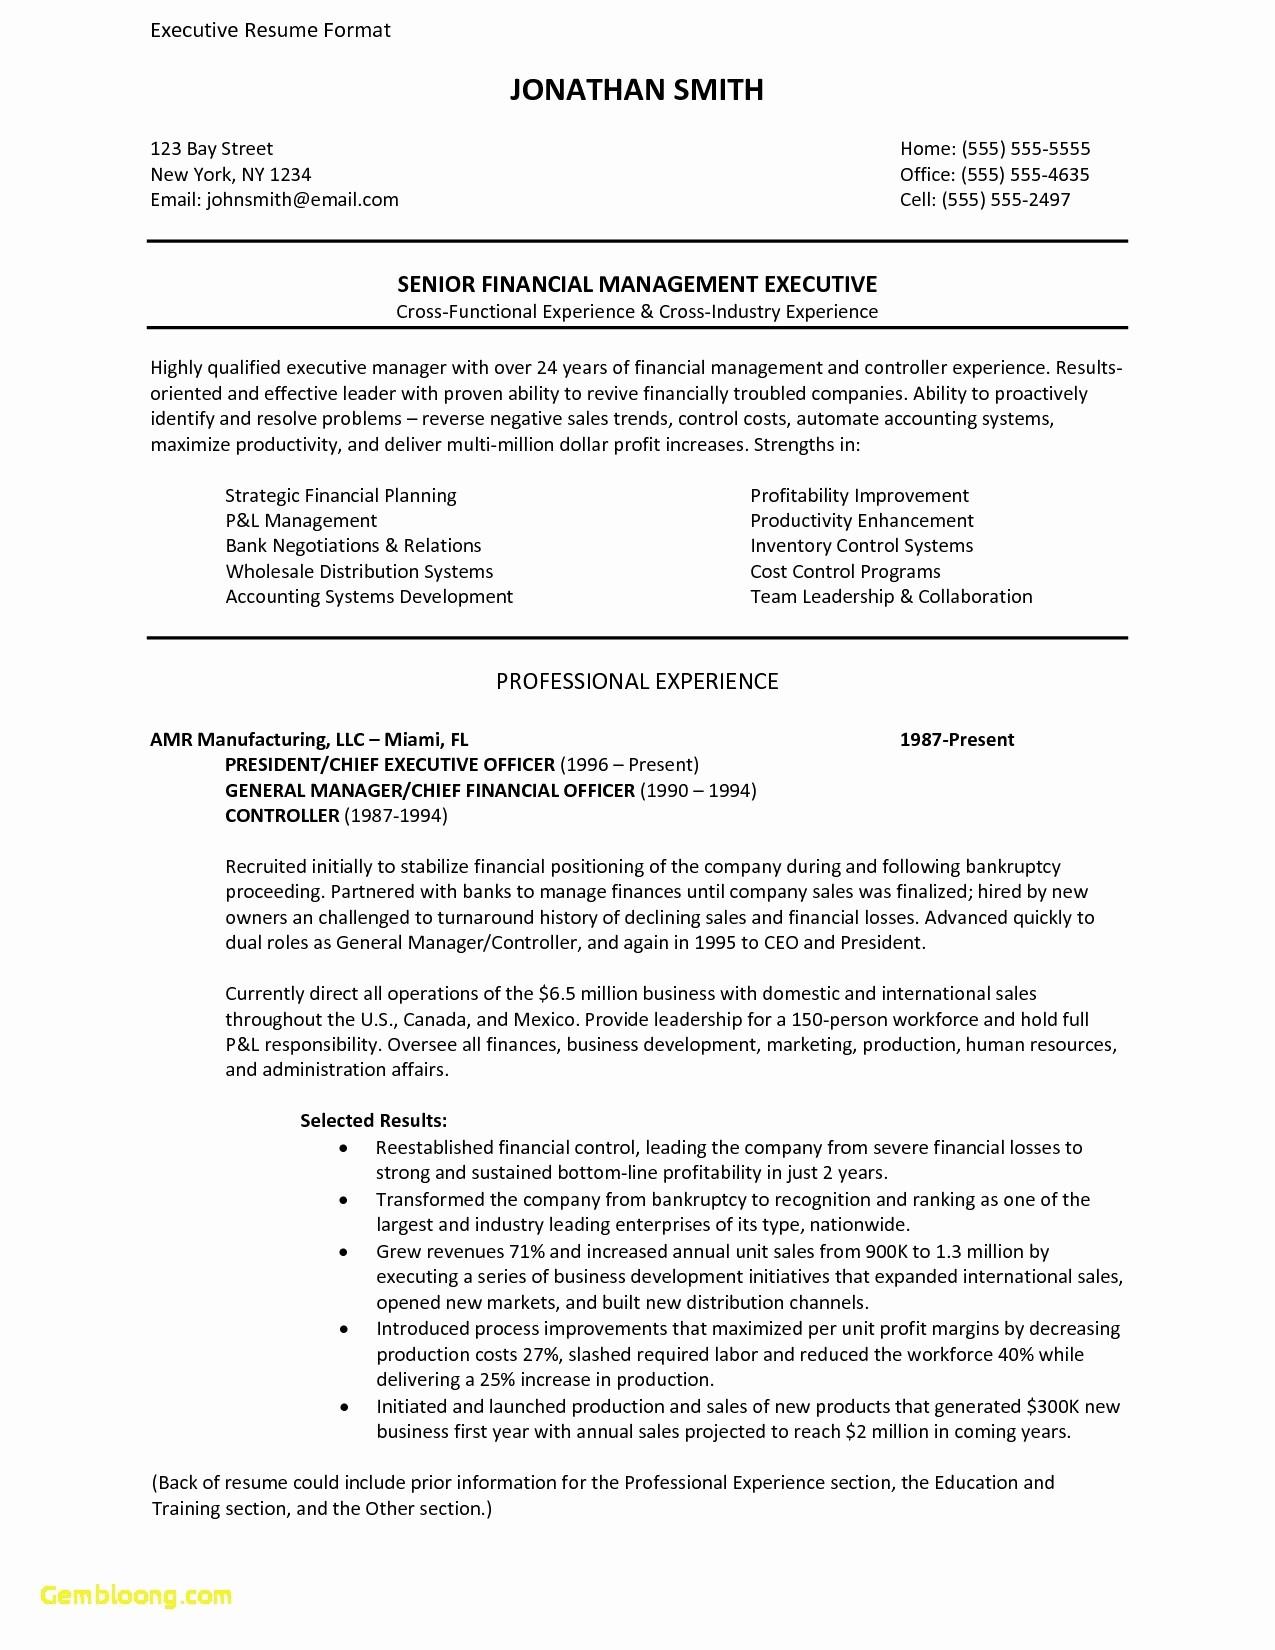 Classic Resume Template Word Download Elegant Classic Resume format Beautiful Classic Resume Template